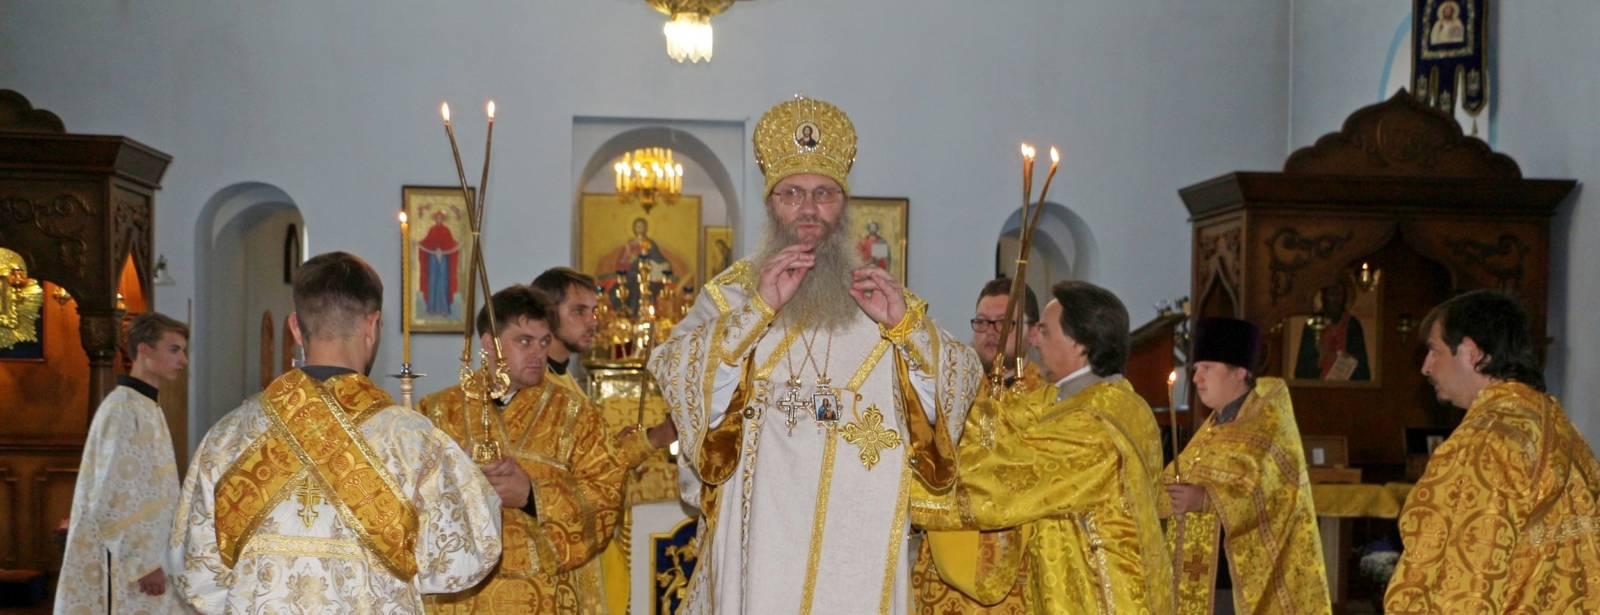 Служение епископа Елисея в канун дня памяти прор. Елисея.